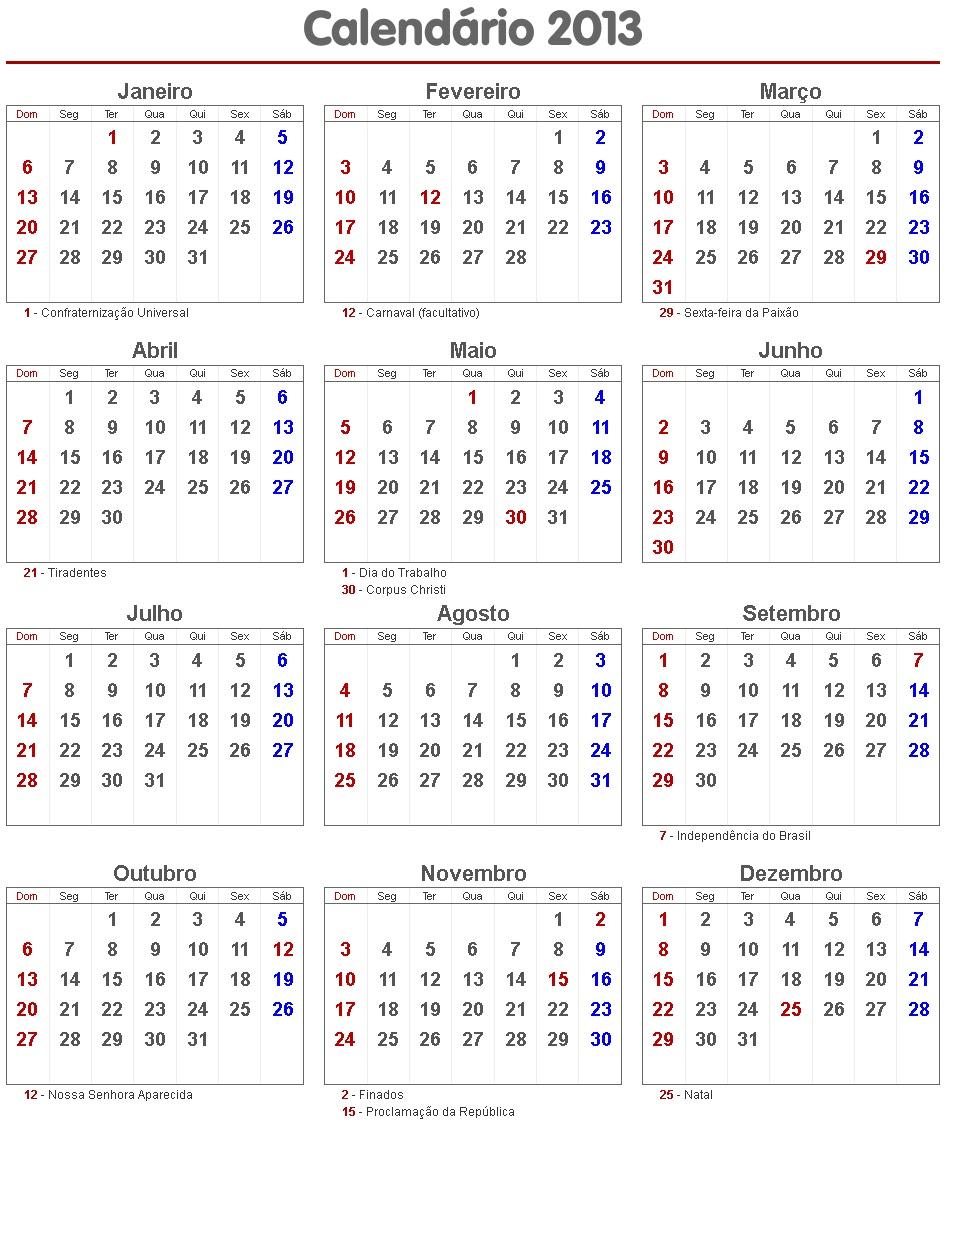 f calendario 2013